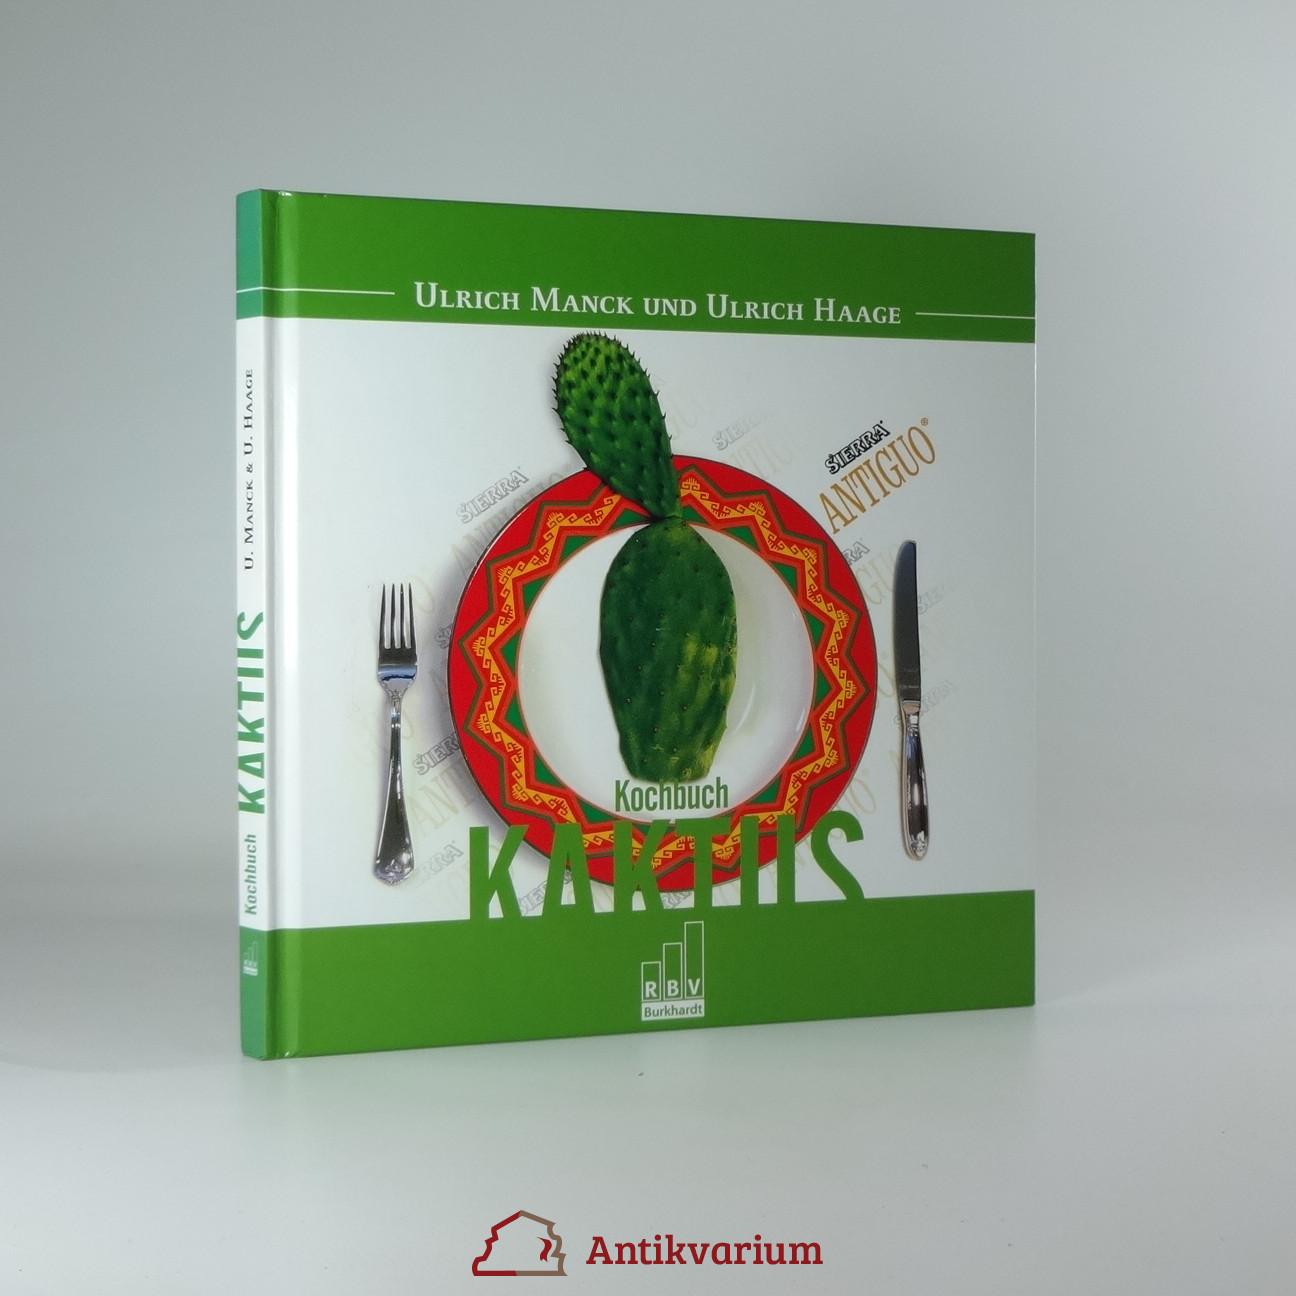 antikvární kniha Kochbuch Kaktus, 2006